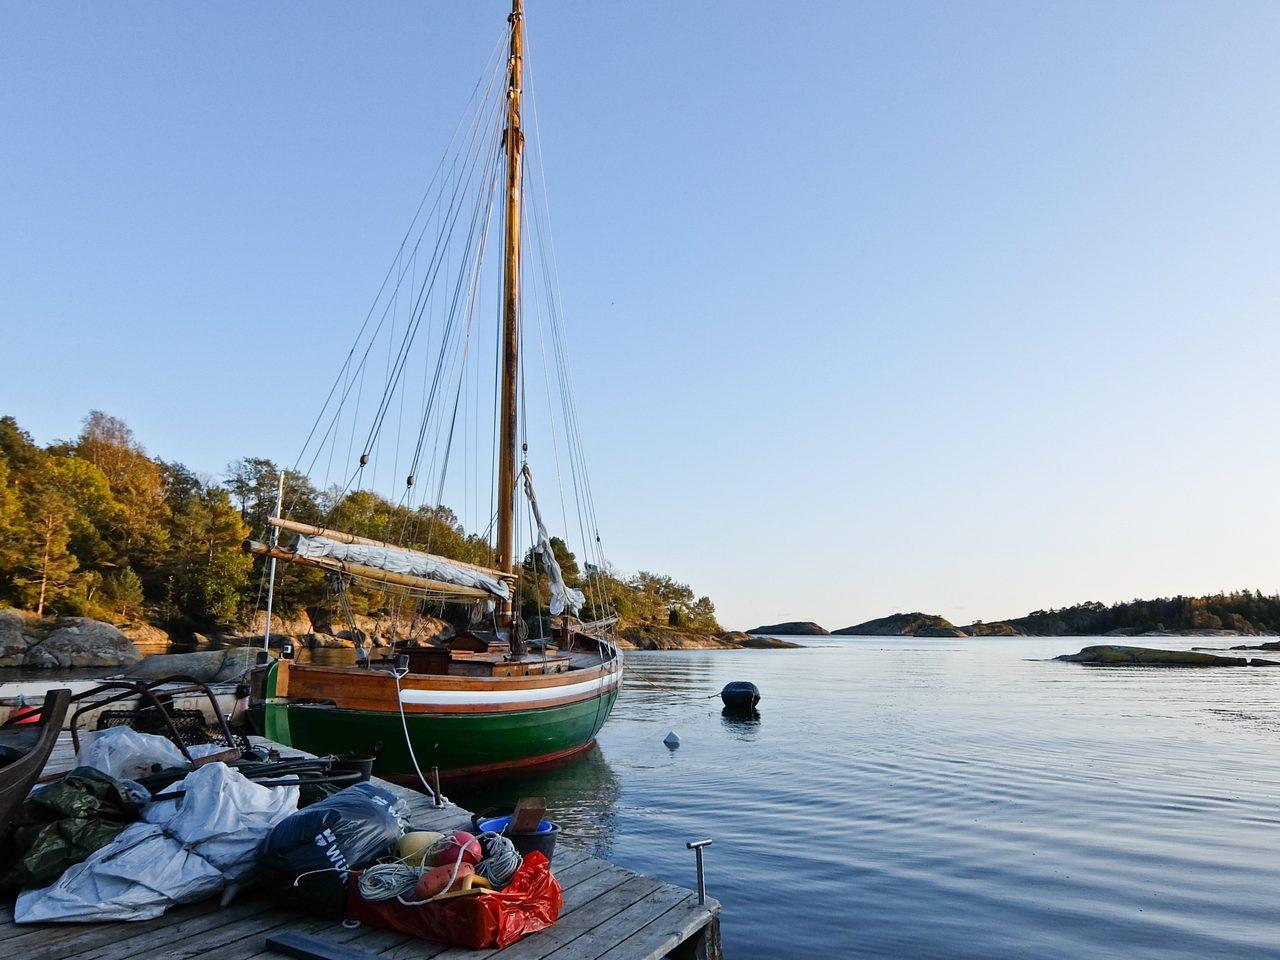 Sandøya Boatyard